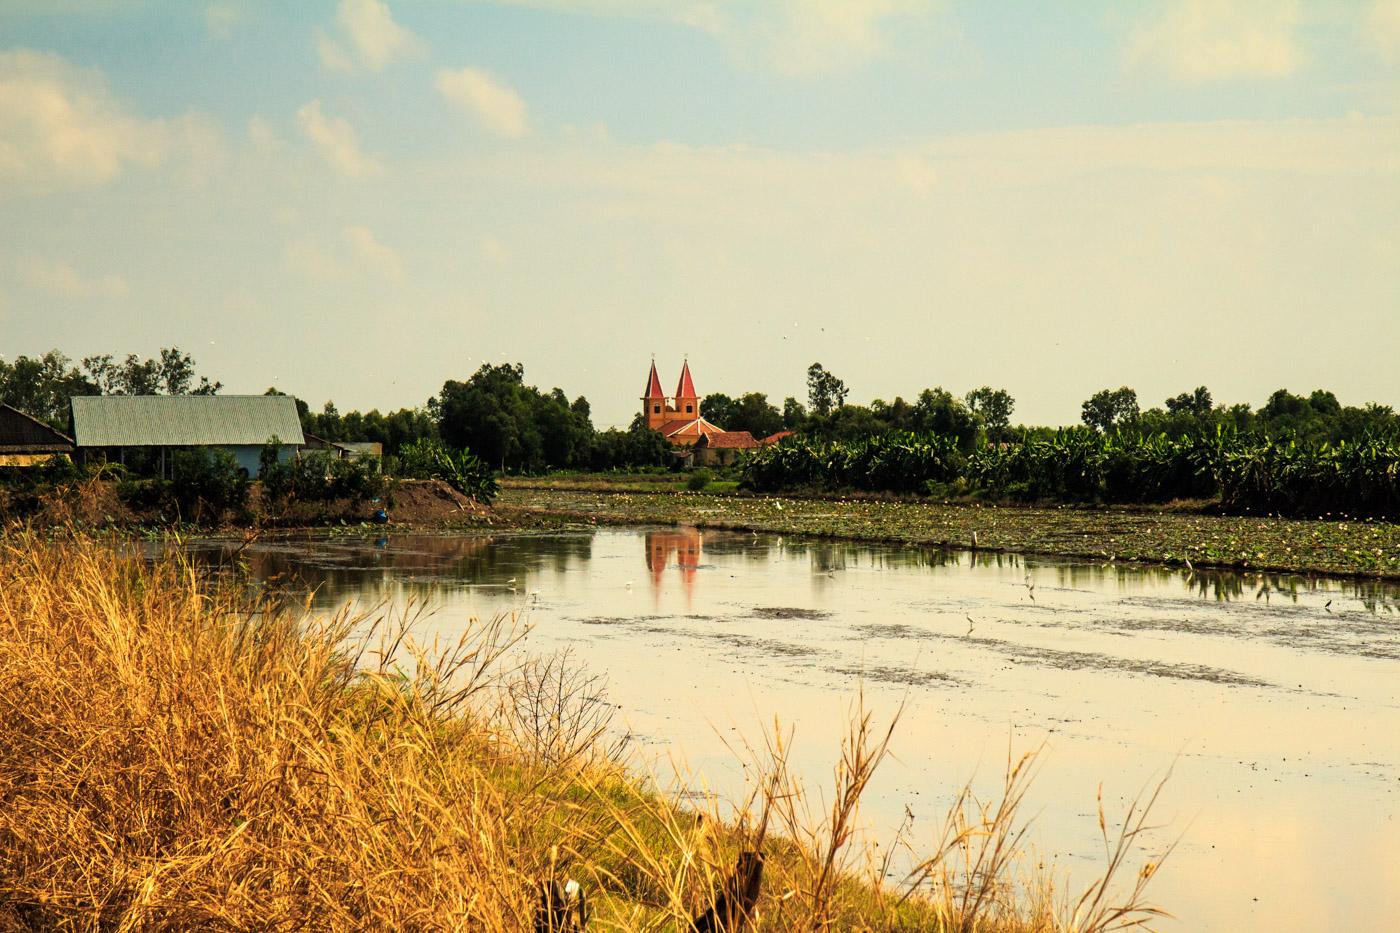 A church among the fields.